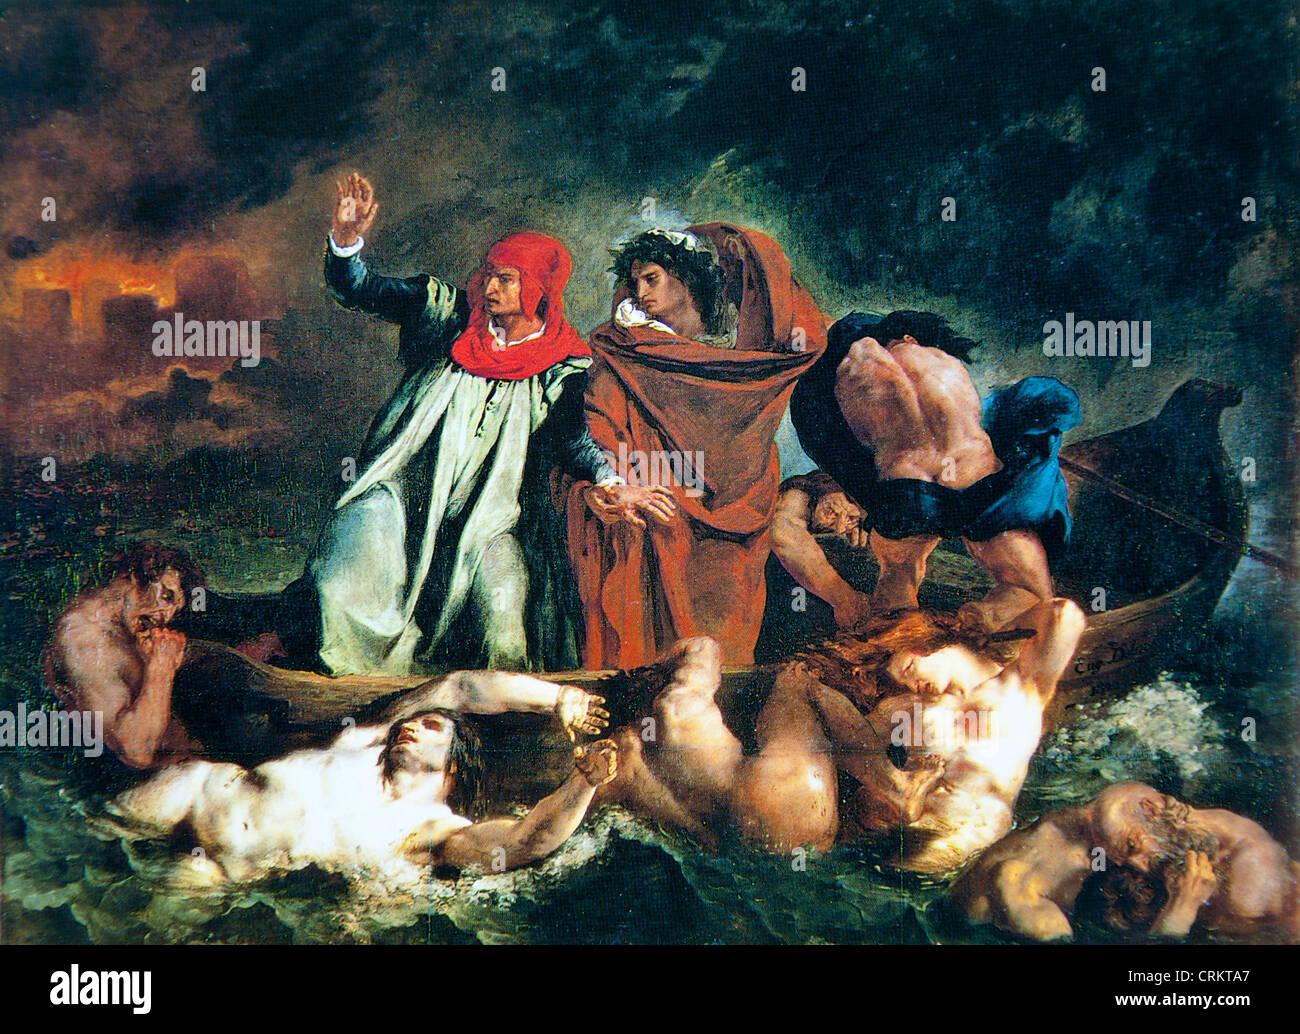 Eugene Delacroix – The Barque of Dante - Stock Image